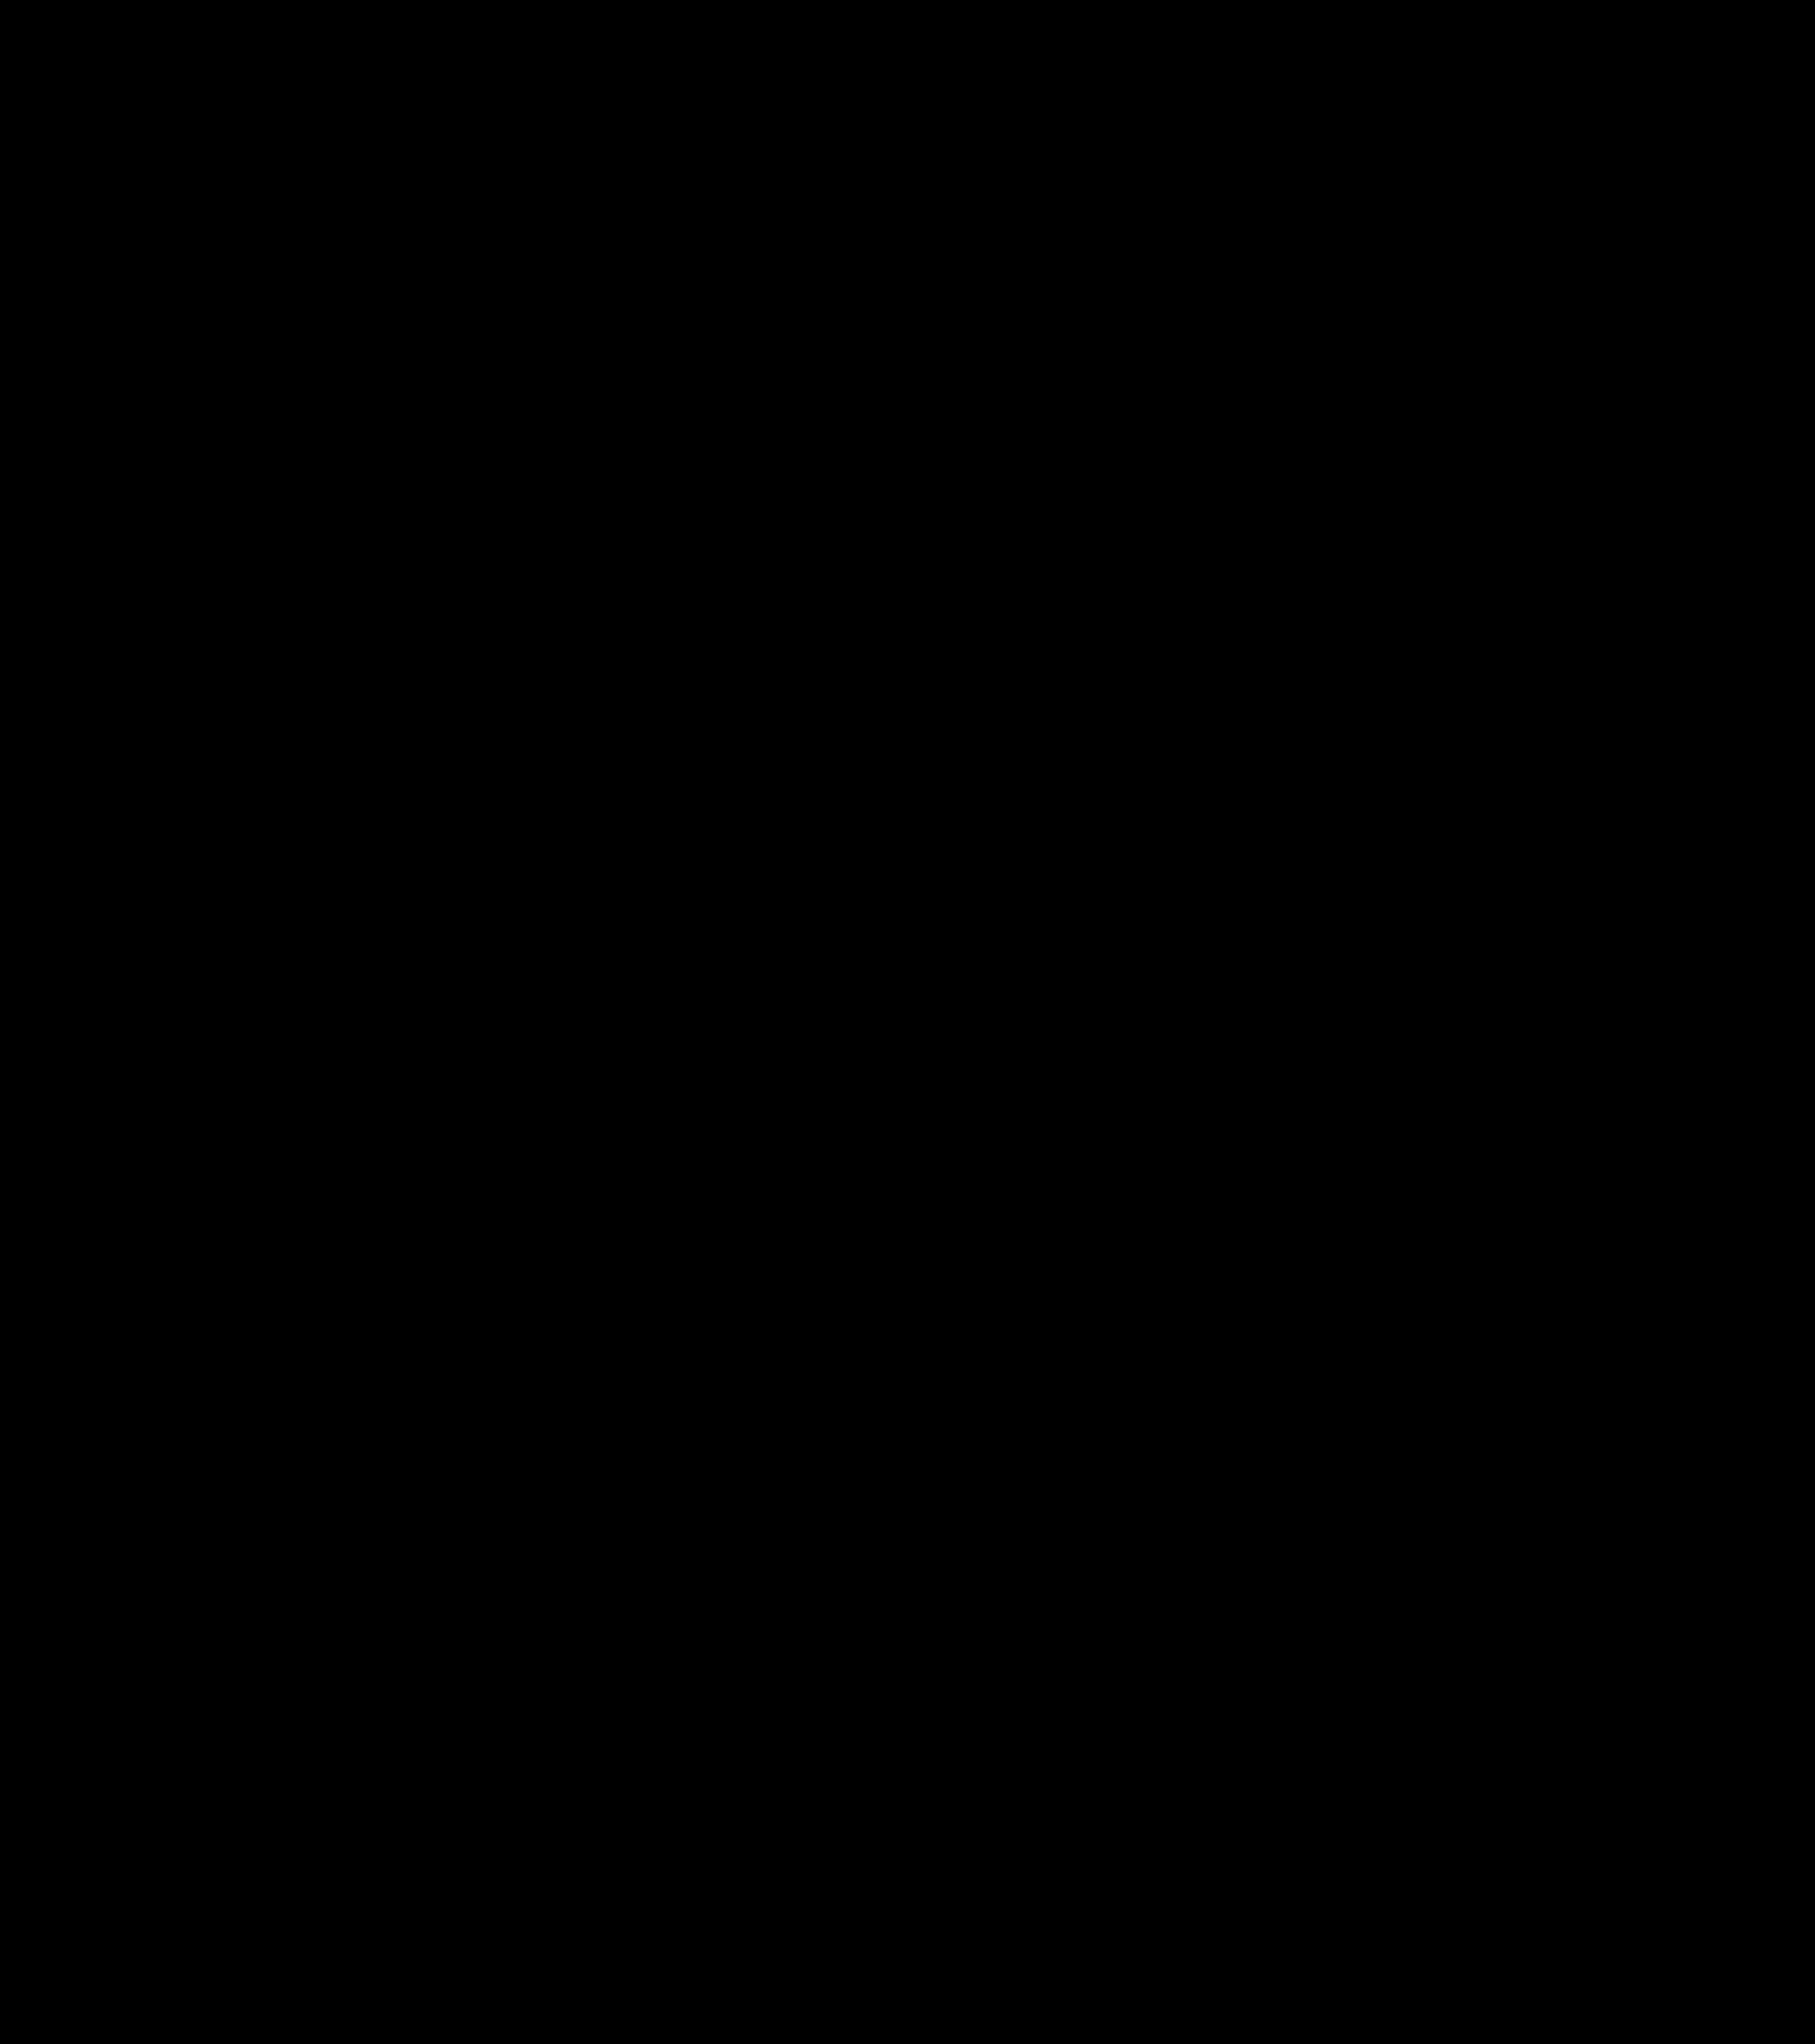 Vintage frame silhouette big. Mirror clipart illustration